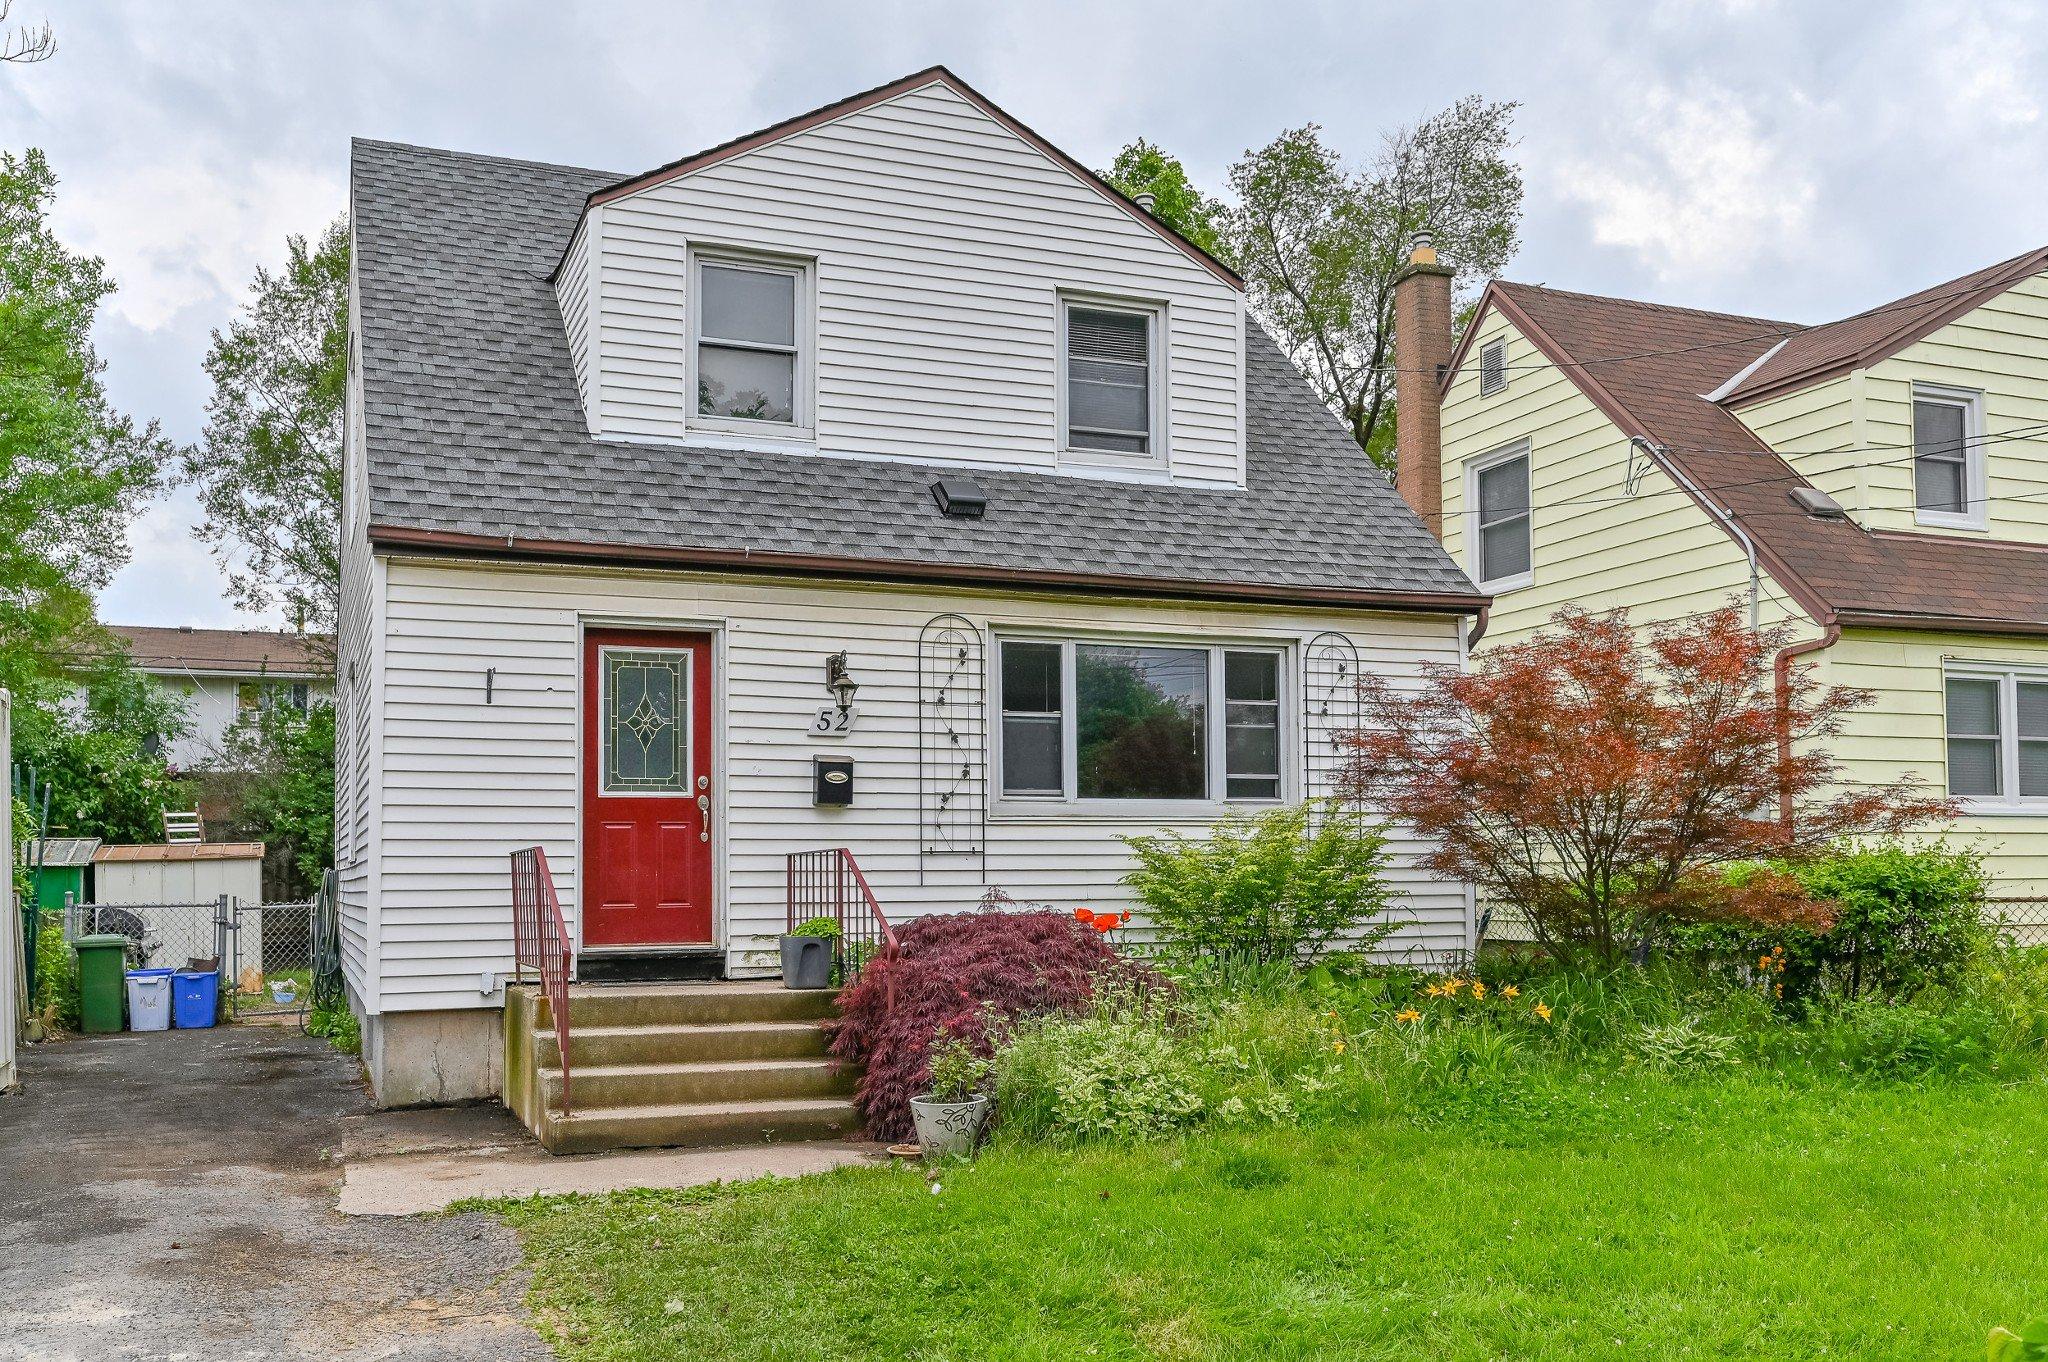 Main Photo: 52 Martha Street in Hamilton: House for sale : MLS®# H4056393